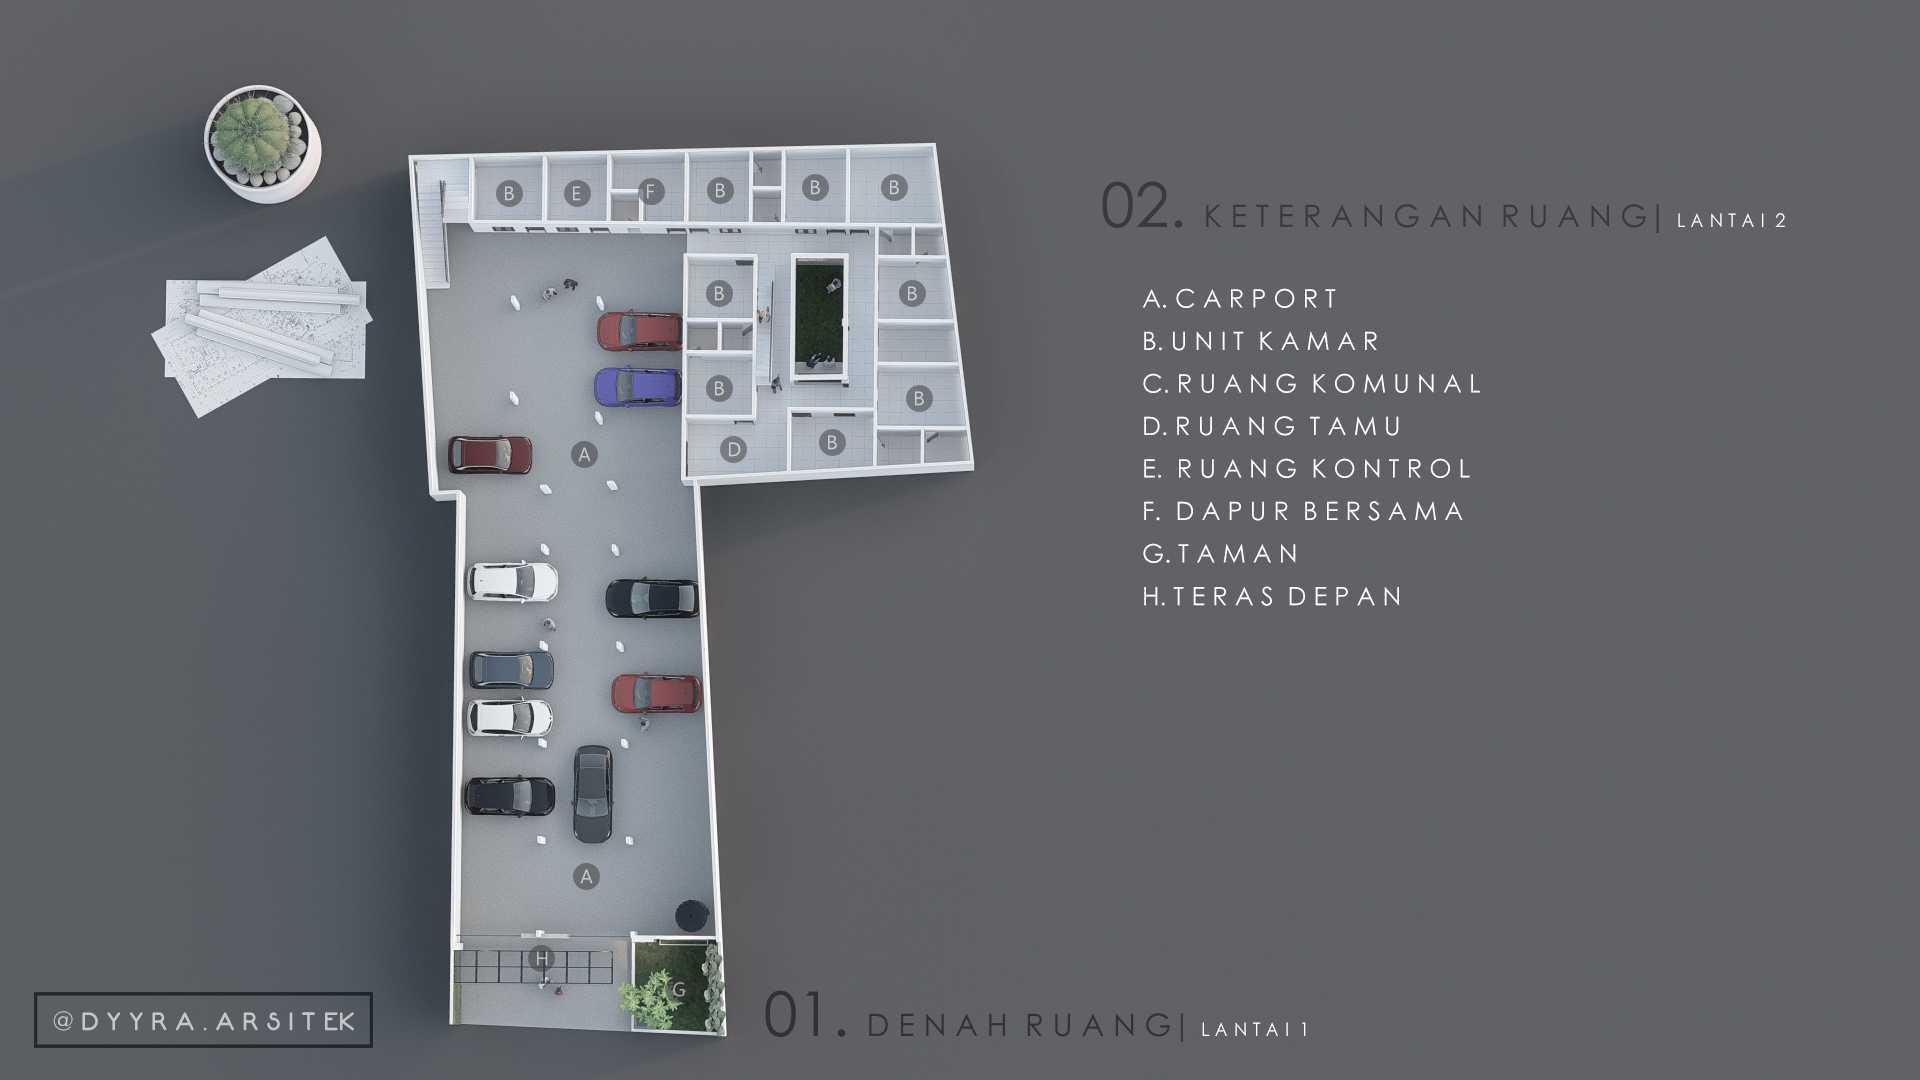 Yusrildwiihzamahendra Design Boarding House Kota Malang Malang, Kota Malang, Jawa Timur, Indonesia Malang, Kota Malang, Jawa Timur, Indonesia Yusrildwiihzamahendra-Design-Boarding-House-Kota-Malang  131646